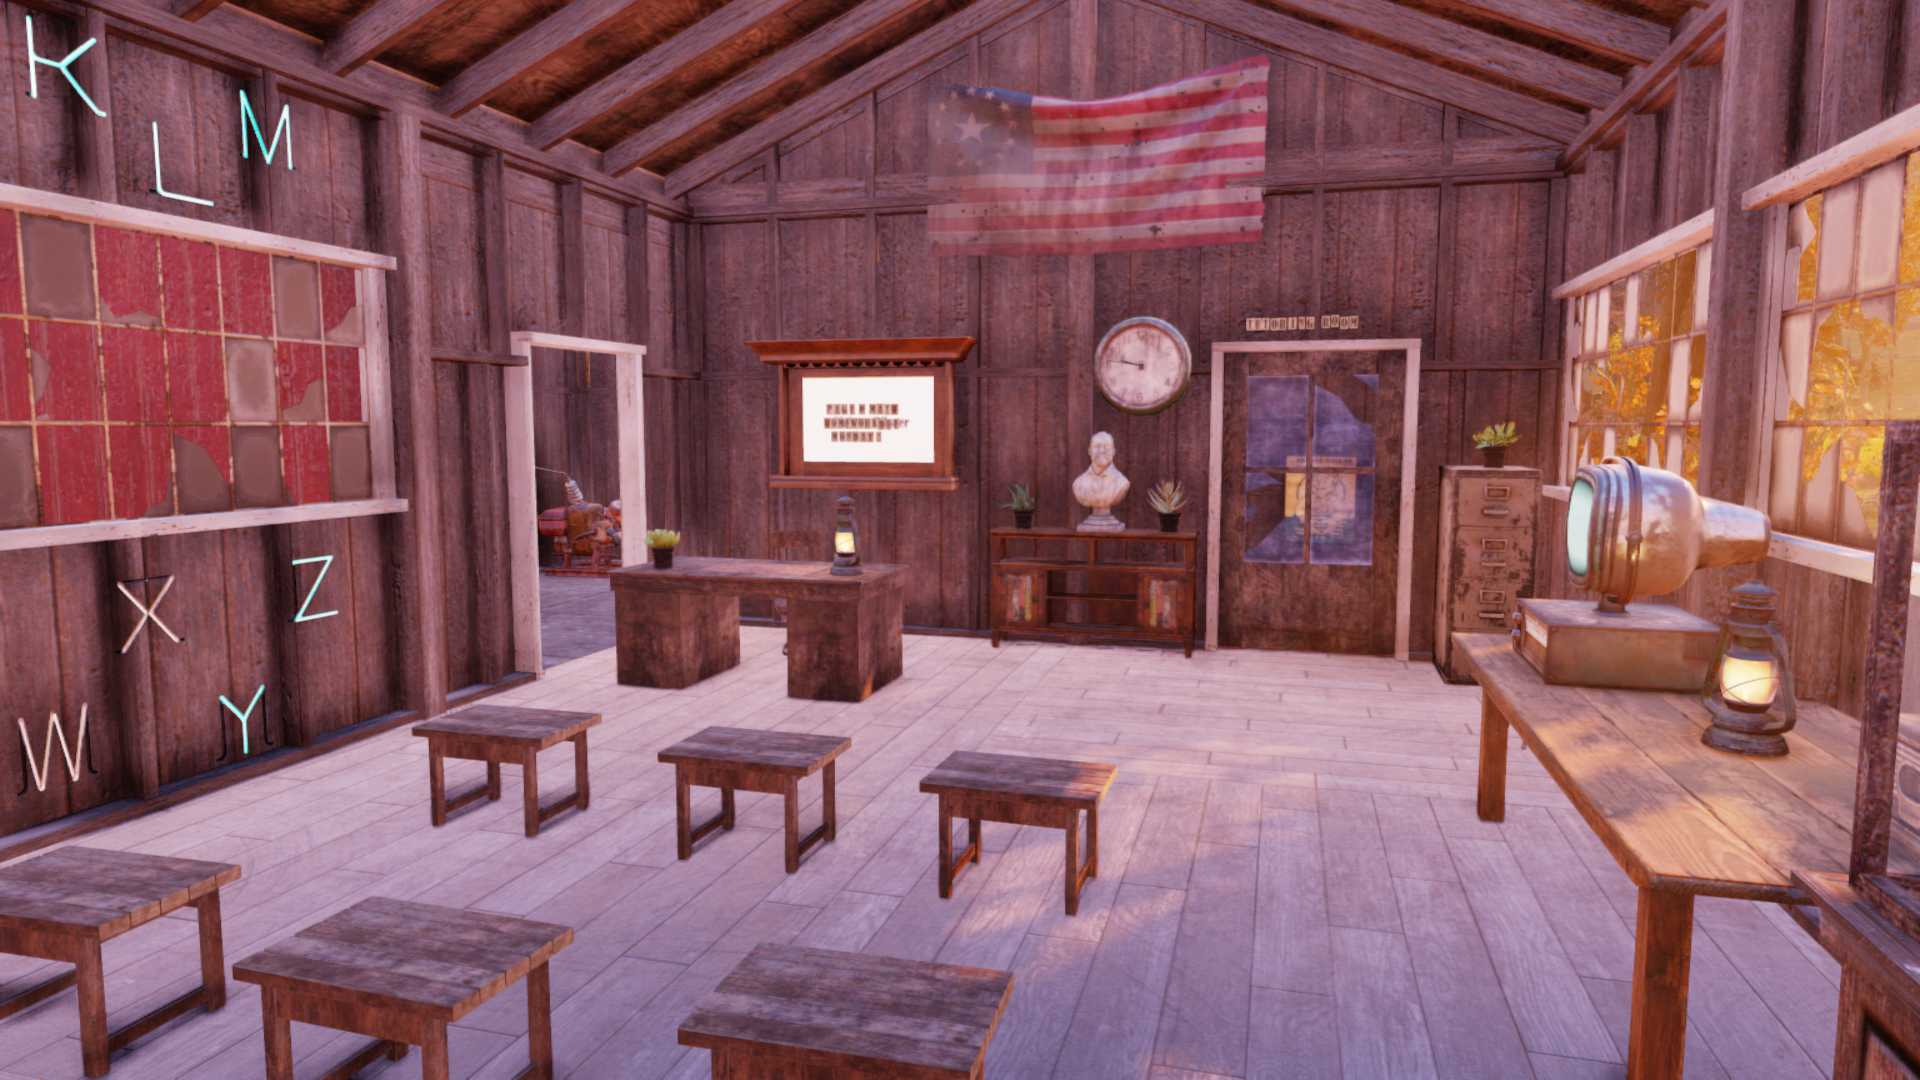 Fallout 76 Mathe Camp Klassenzimmer 2